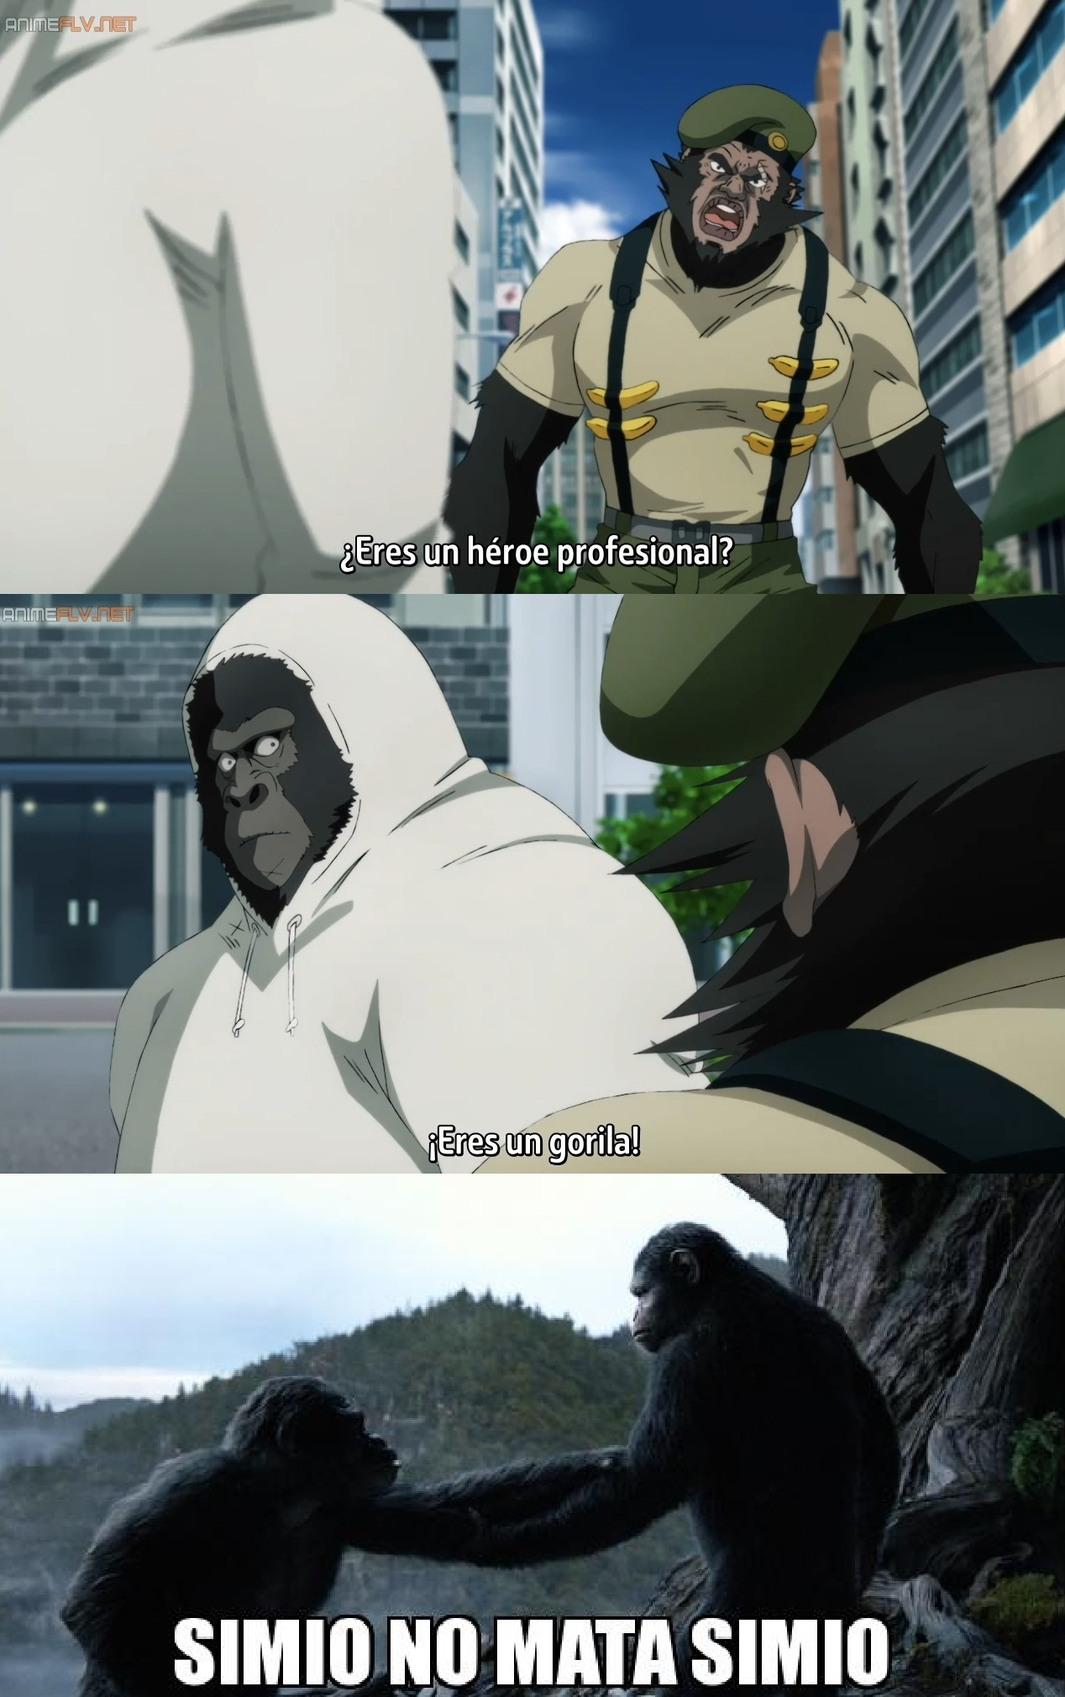 El primero gorila parece Chavez - meme